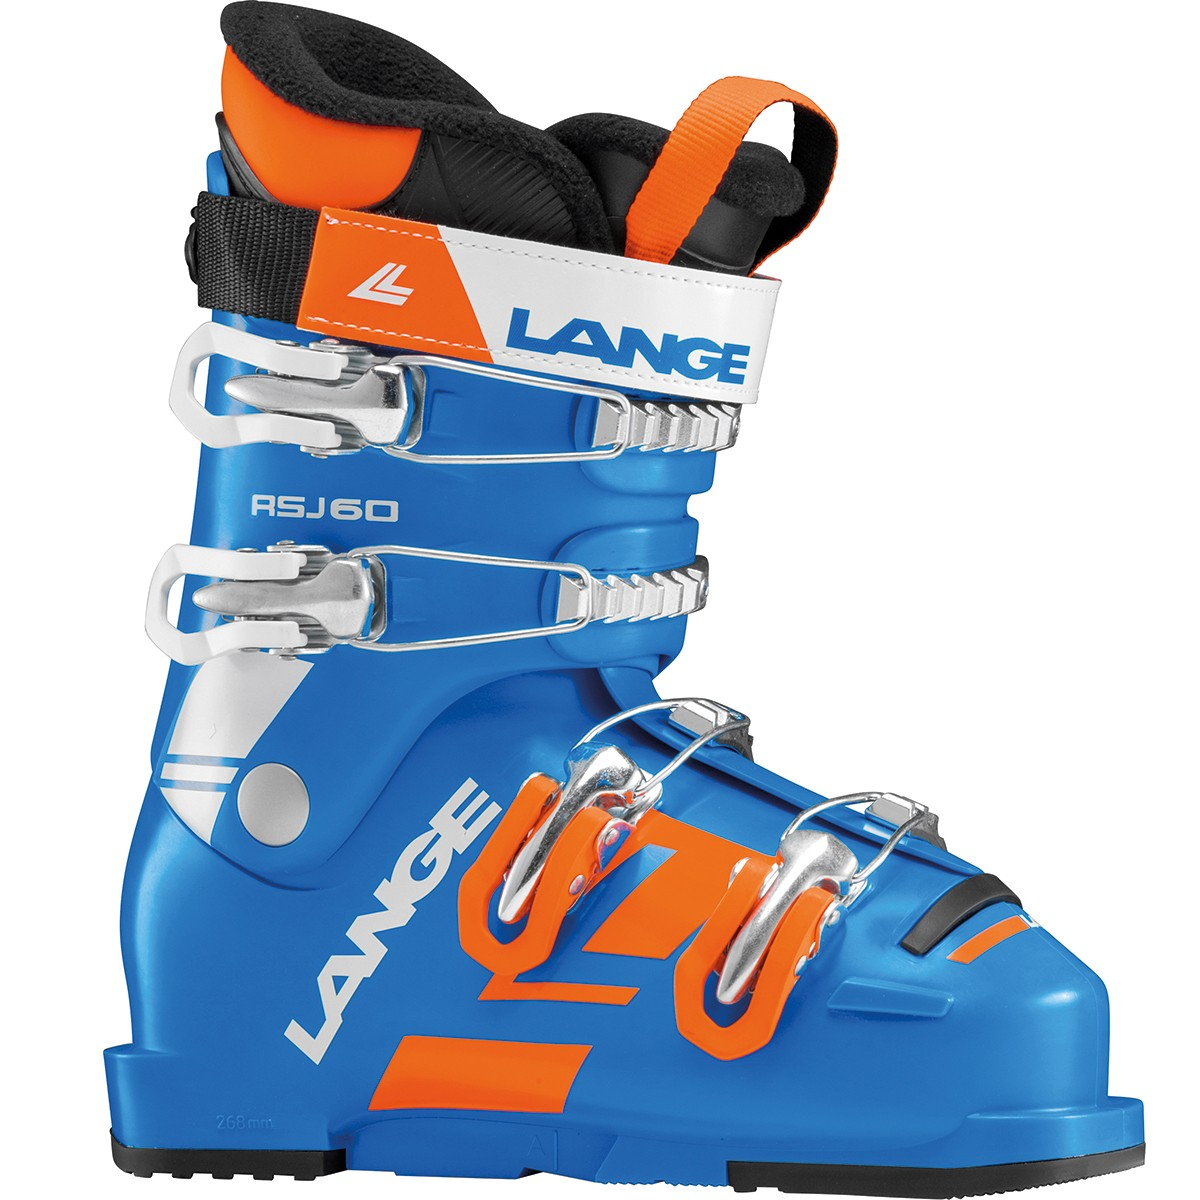 Scarponi sci Lange Rsj 60 (Colore: blu-arancio, Taglia: 26)